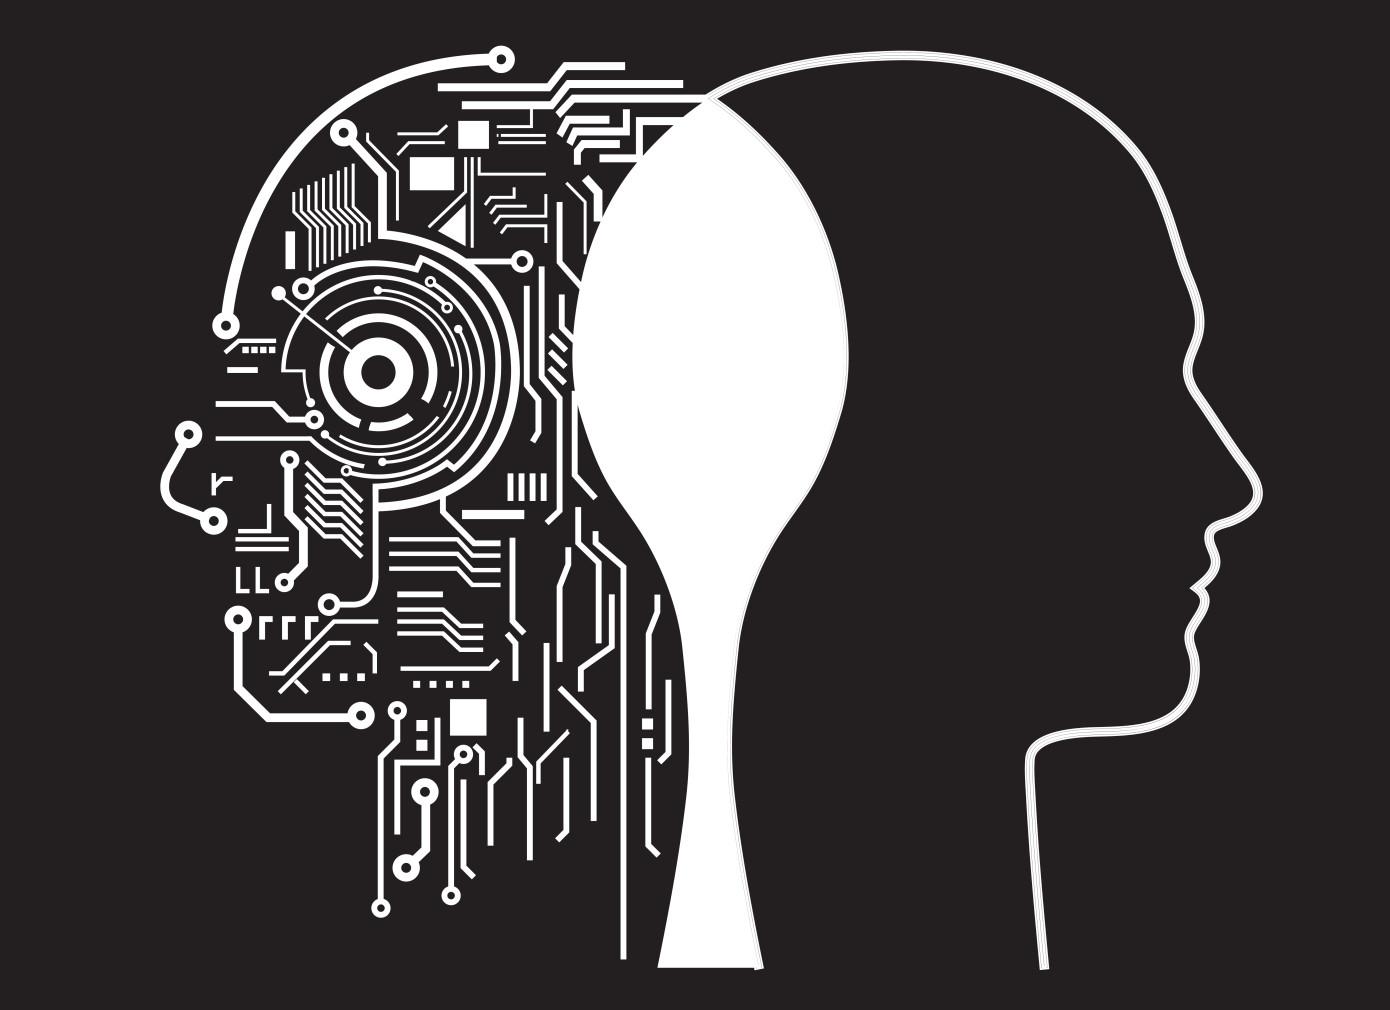 humanrobotoverlap